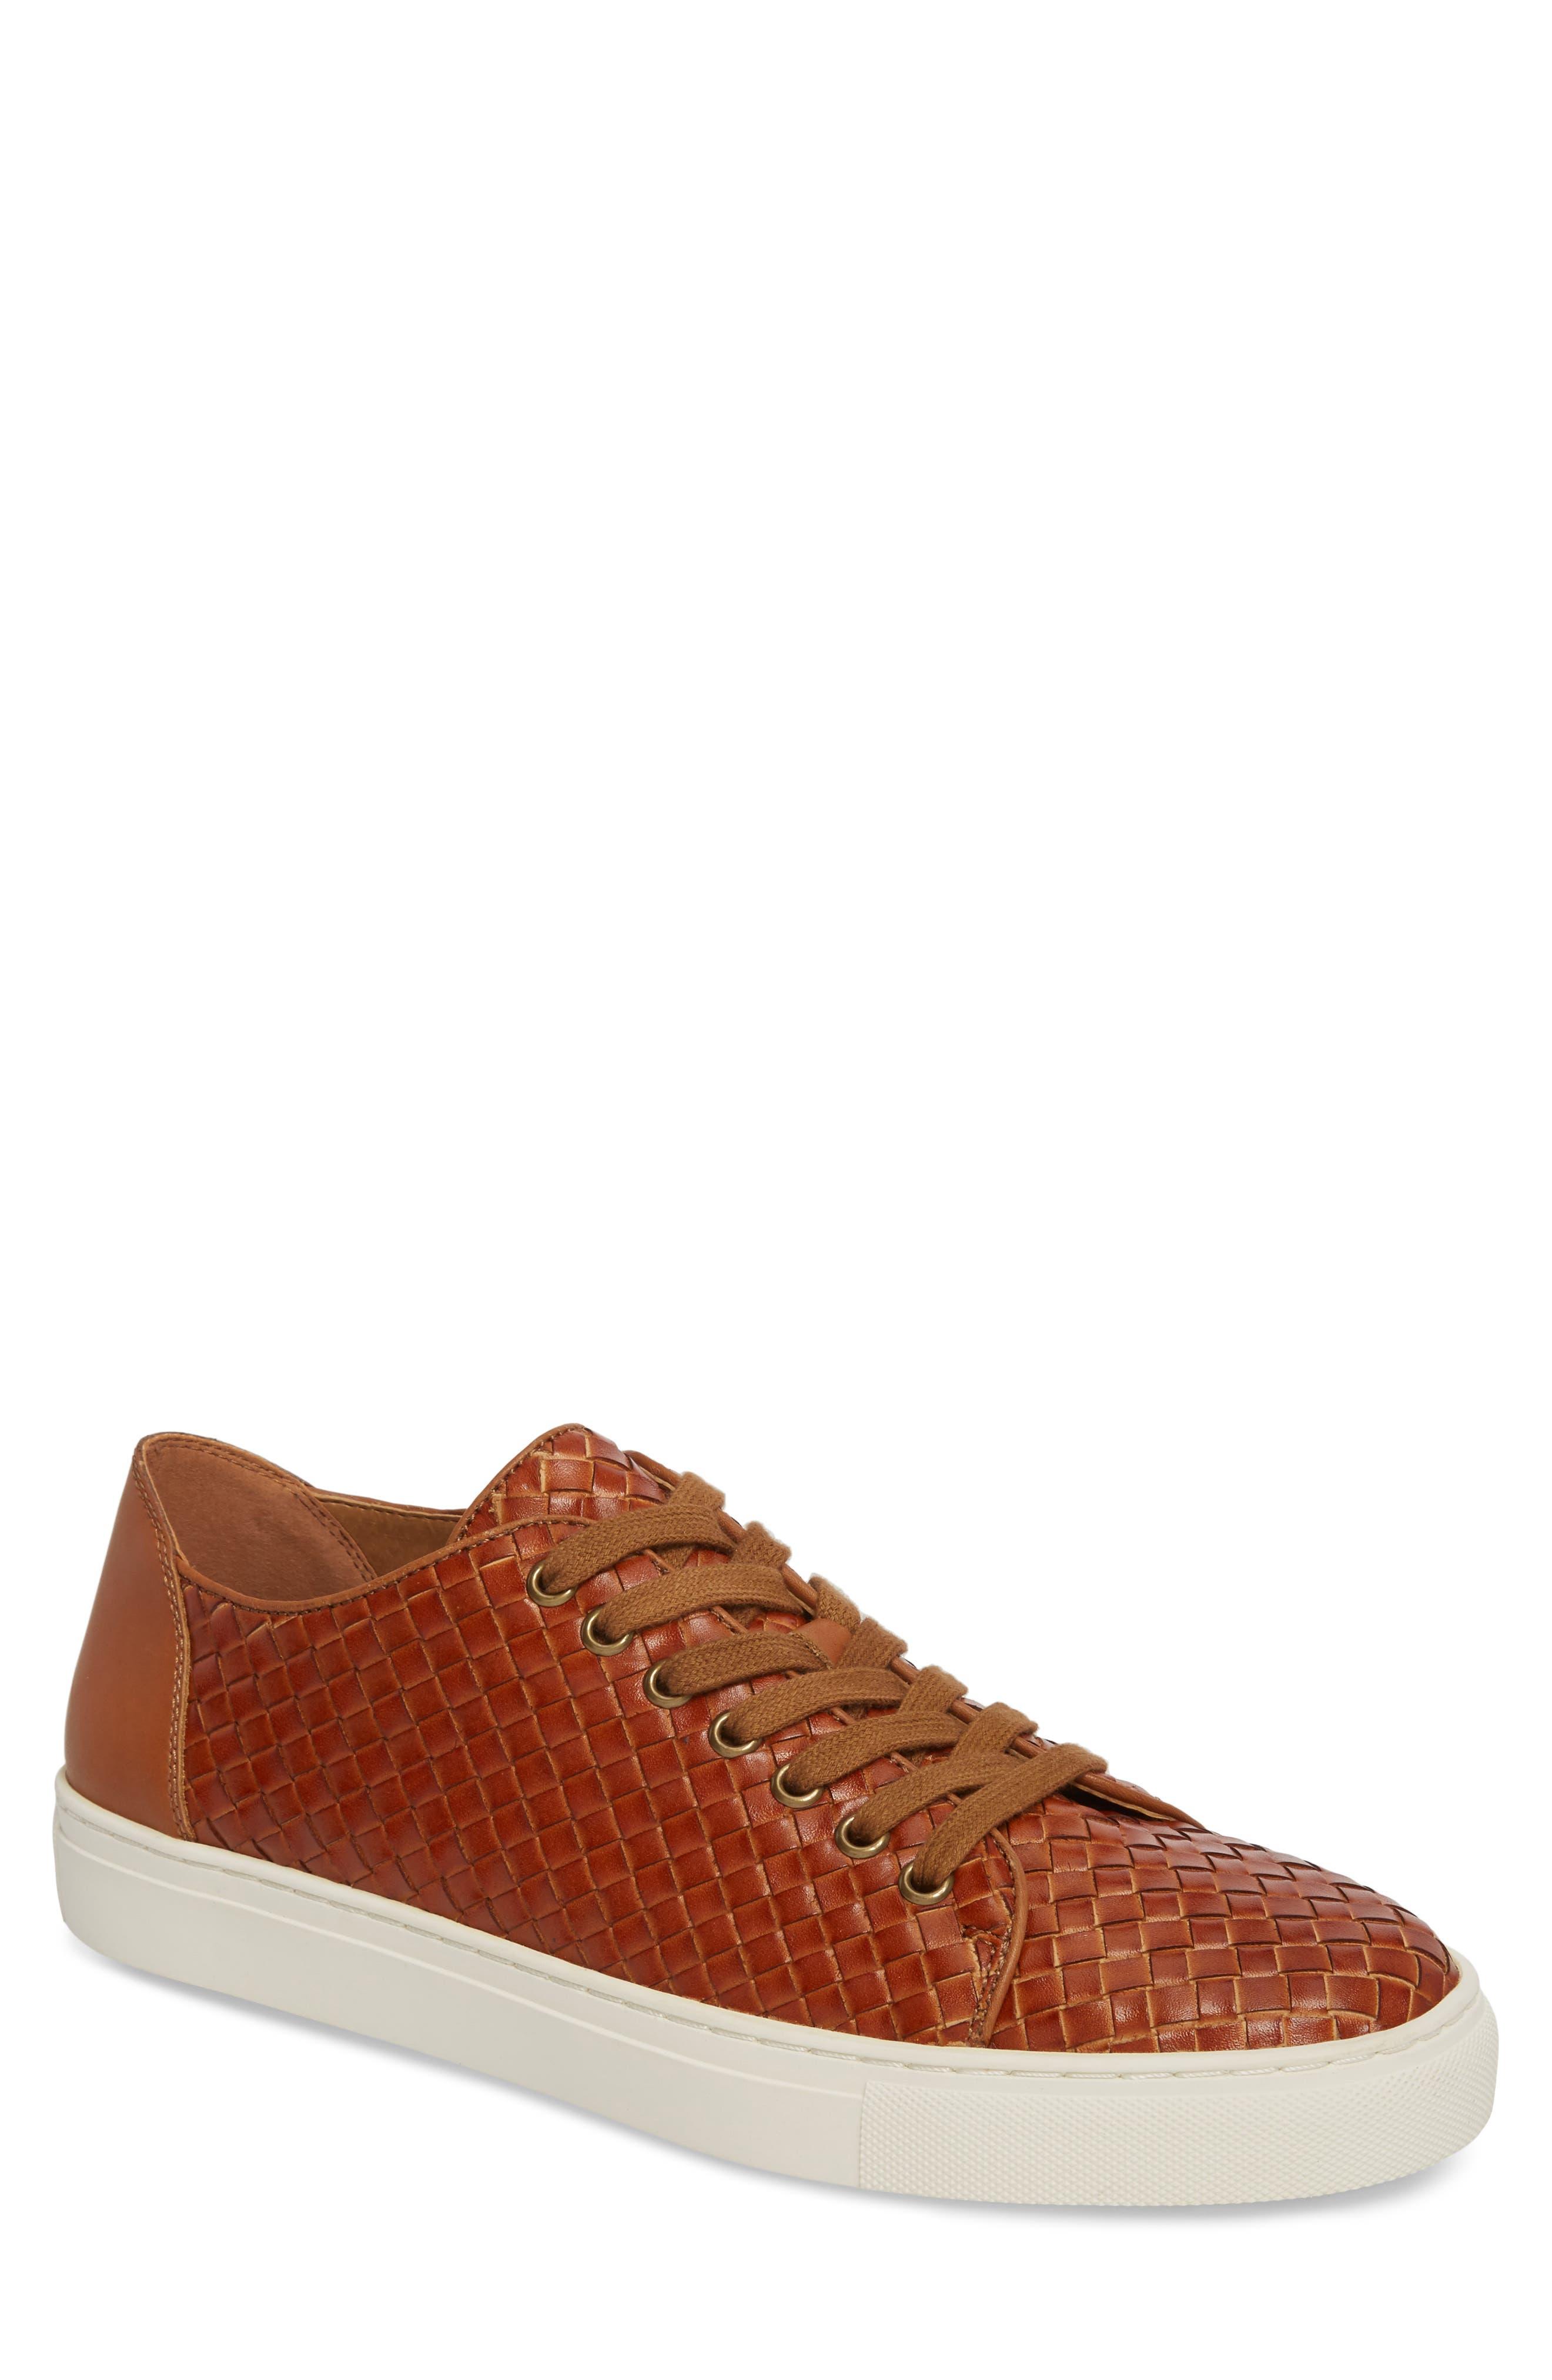 Donald Pliner Alto Woven Low Top Sneaker (Men)